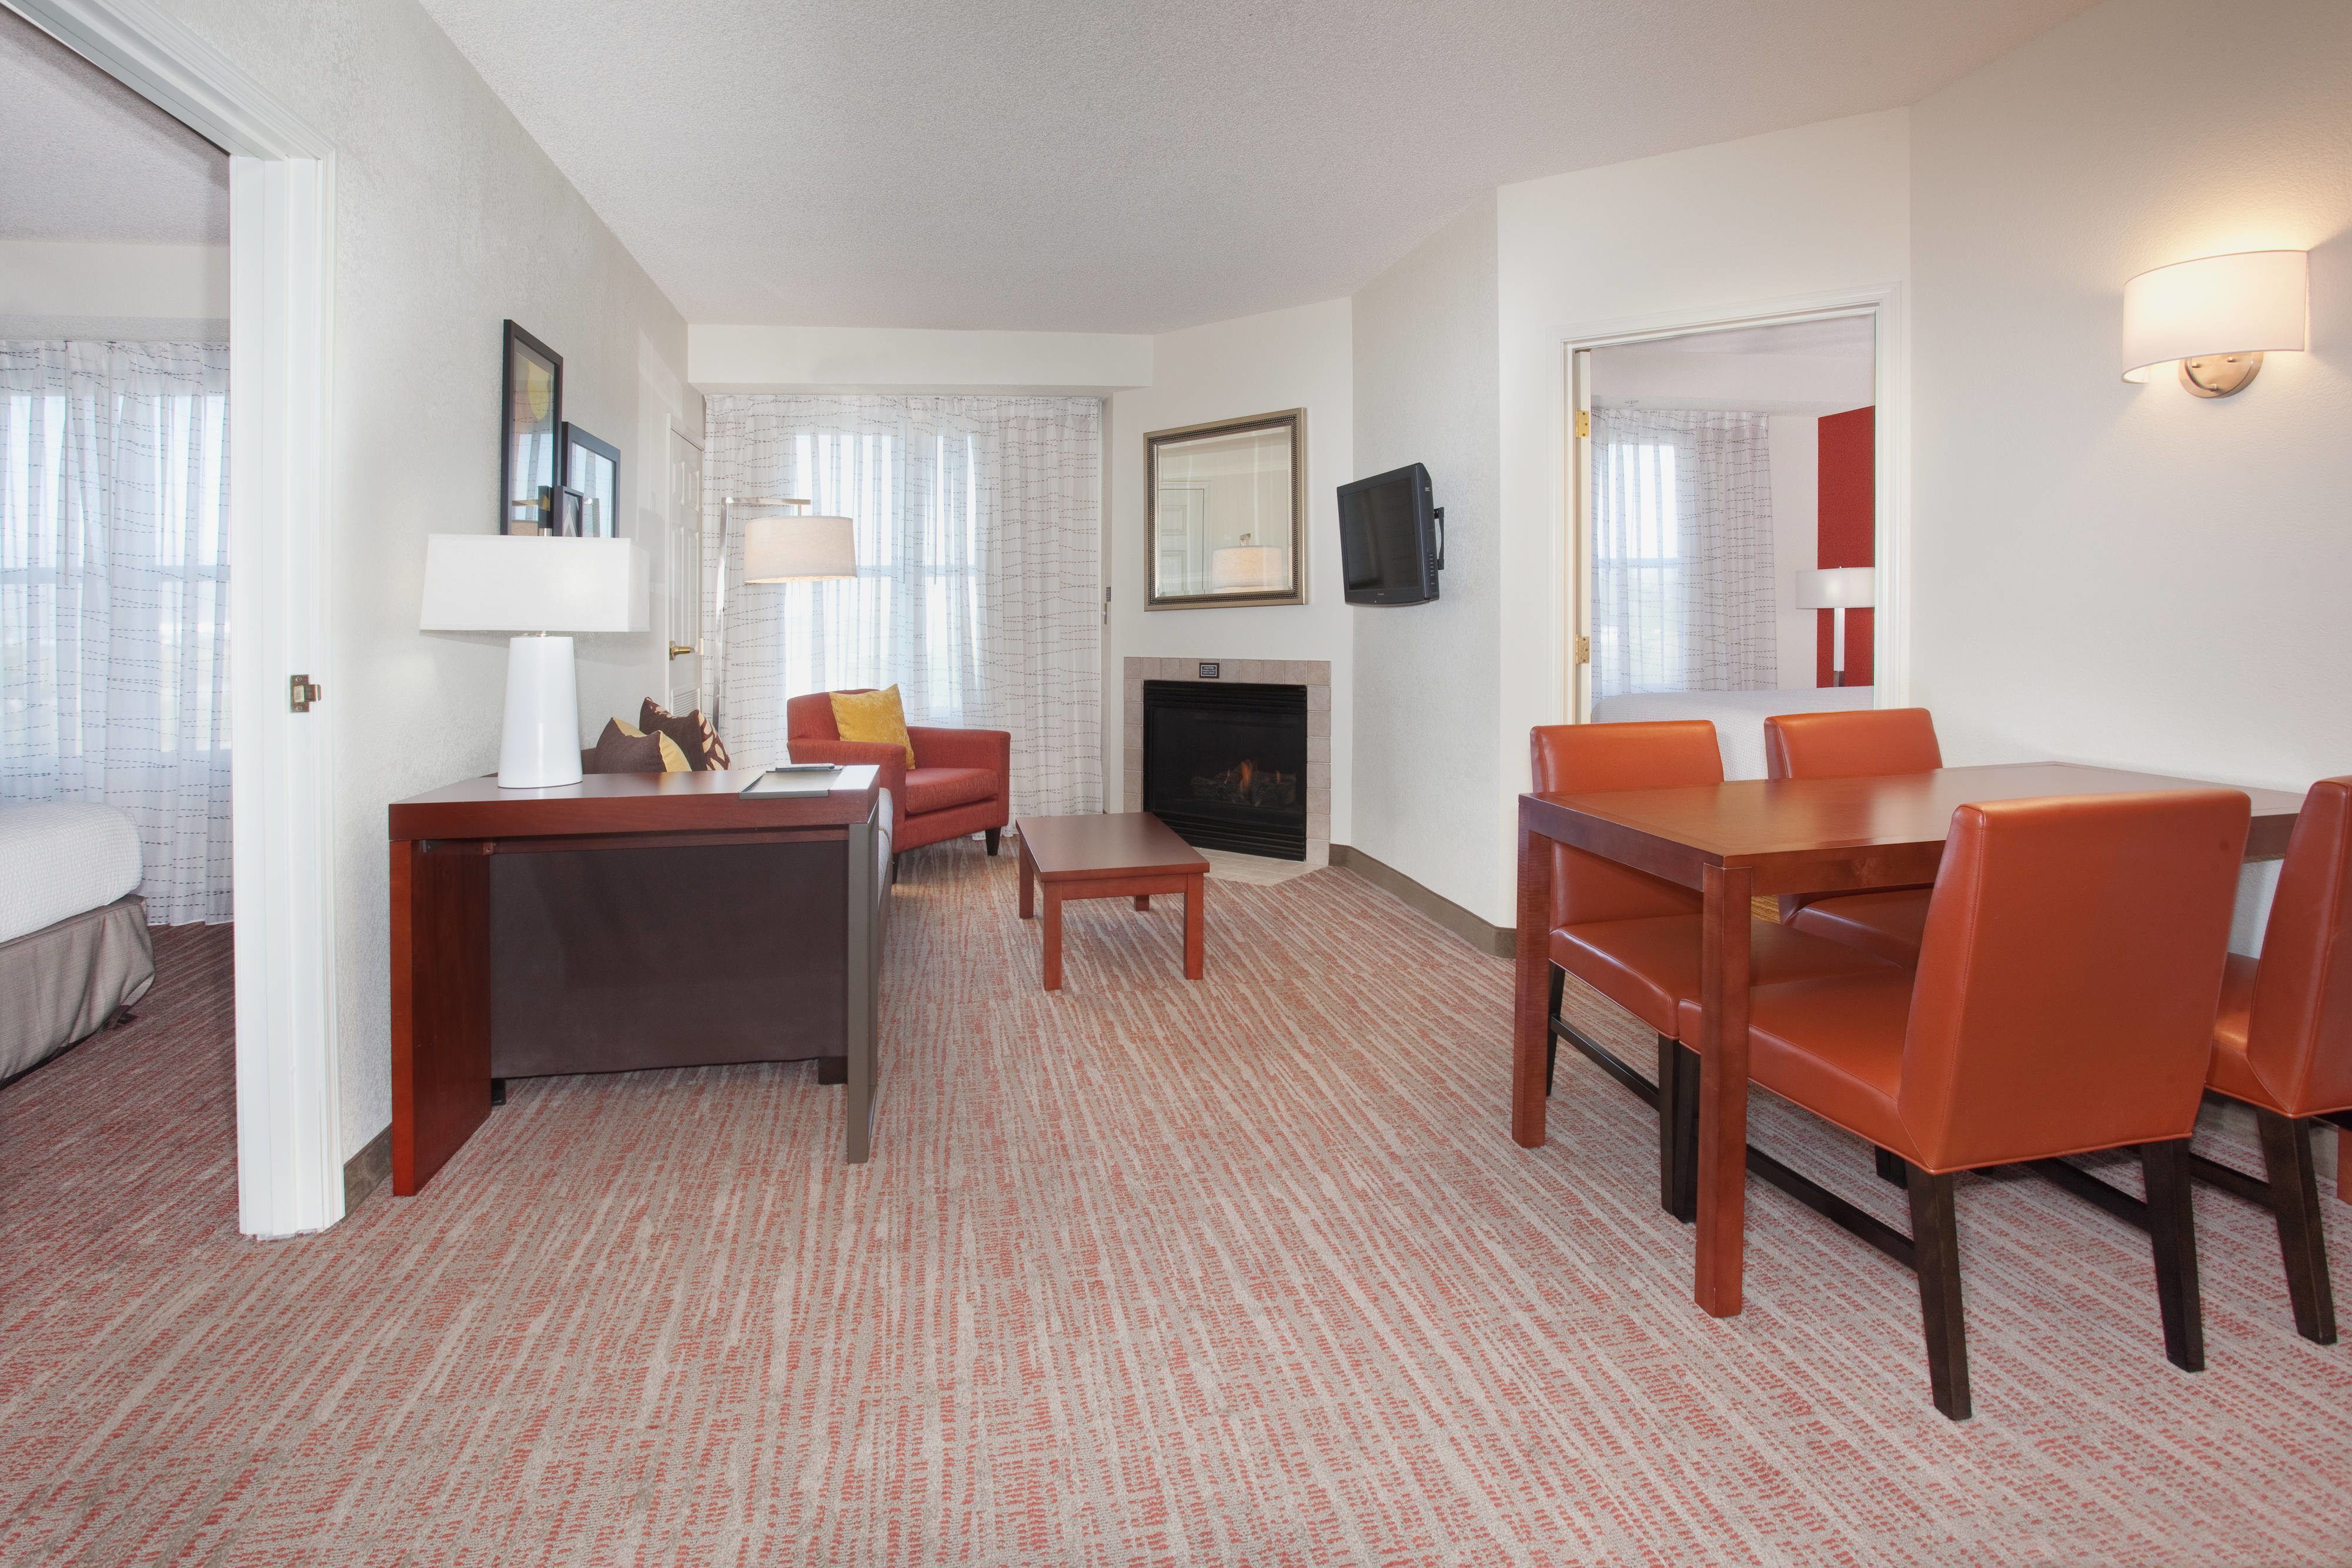 Residence inn salt lake city airport twobedroom suite hotel